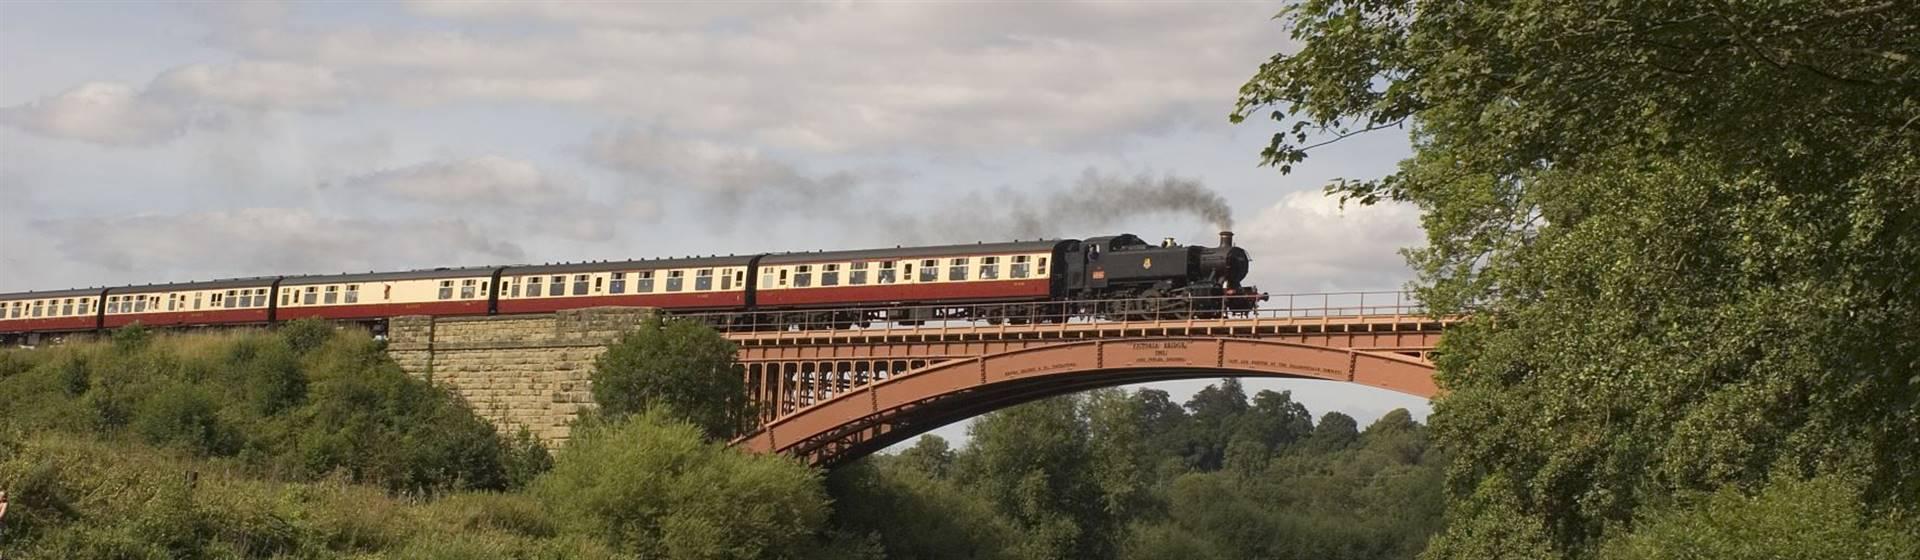 "<img src=""severnvalleyrailway-adobestocklr.jpeg"" alt=""Severn Valley Railway""/>"